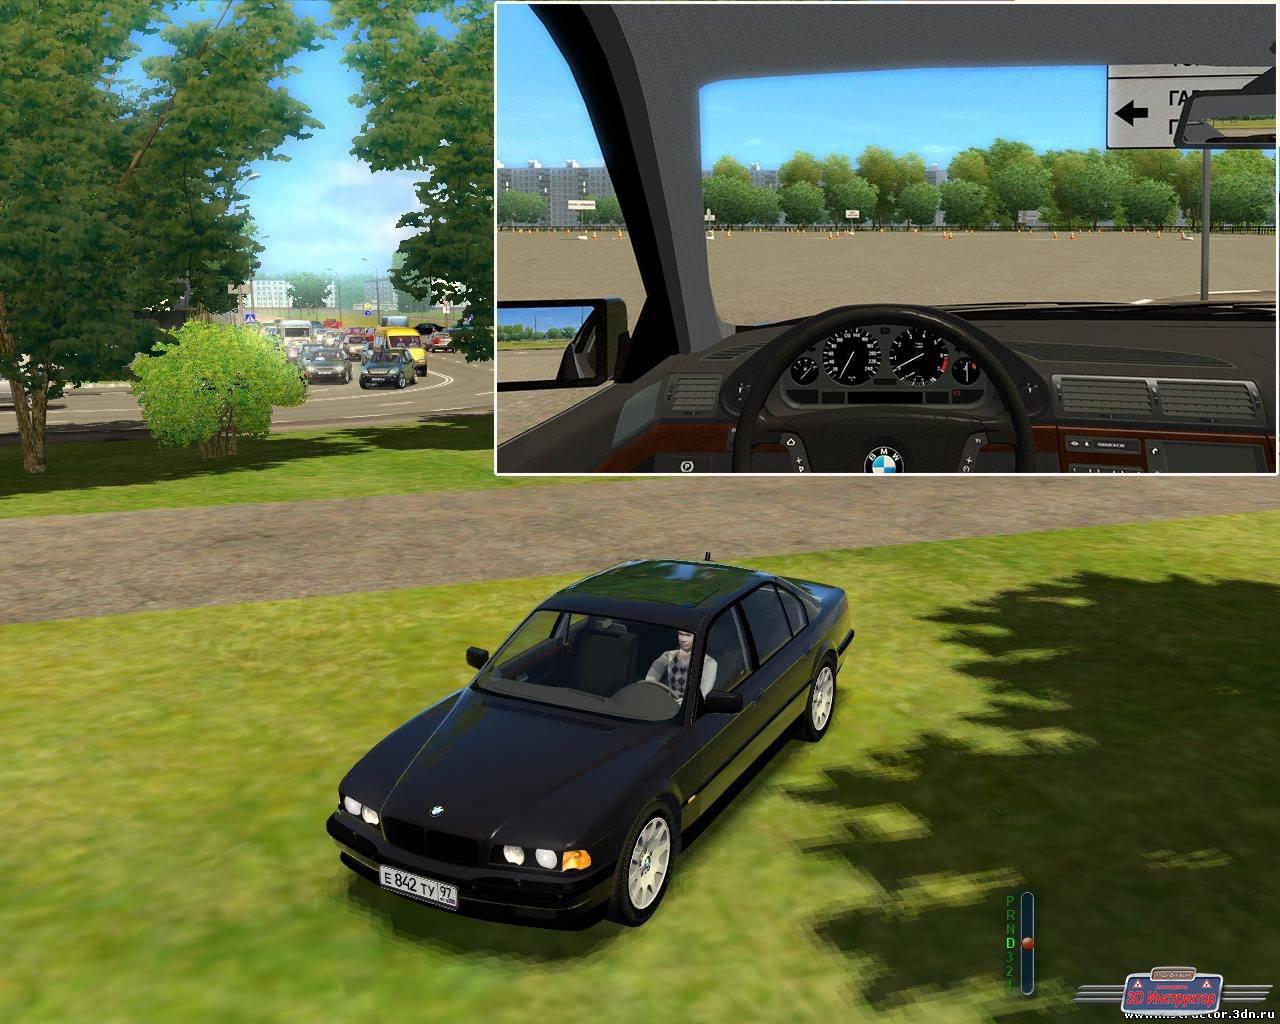 BMW 750i E38 для 3D Инструктор [2.2.7]